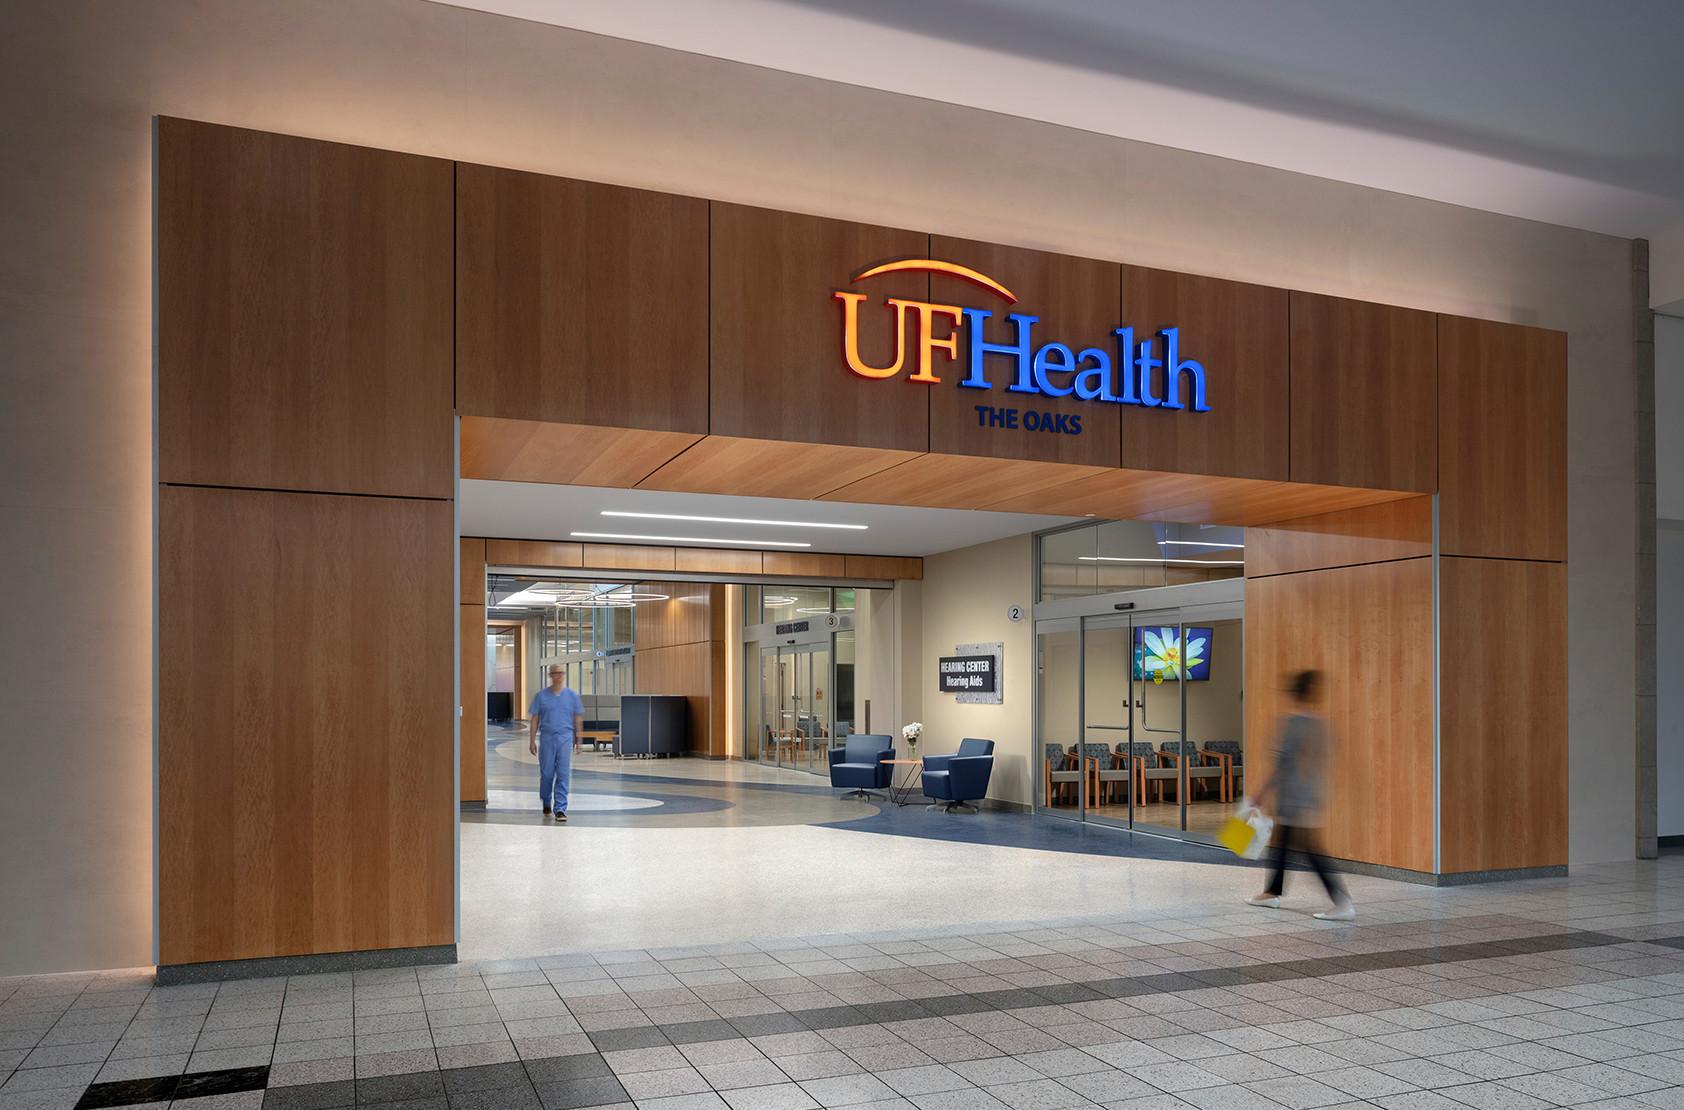 UF Health - The Oaks